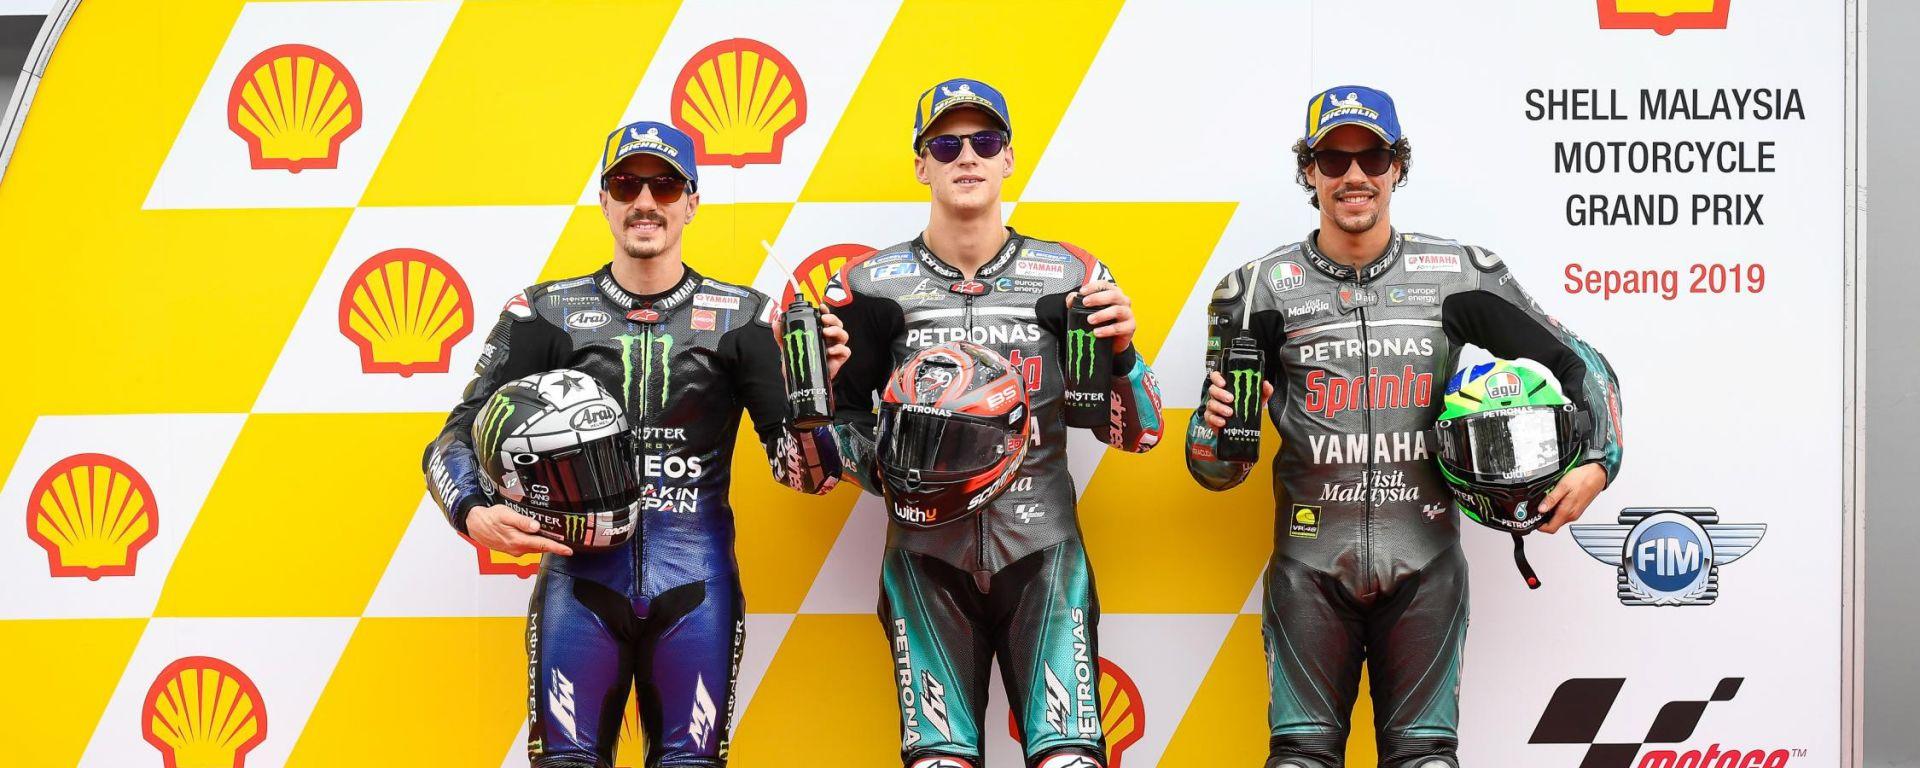 MotoGP Malesia 2019, Sepang: Fabio Quartararo, Maverick Vinales e Franco Morbidelli (Yamaha)